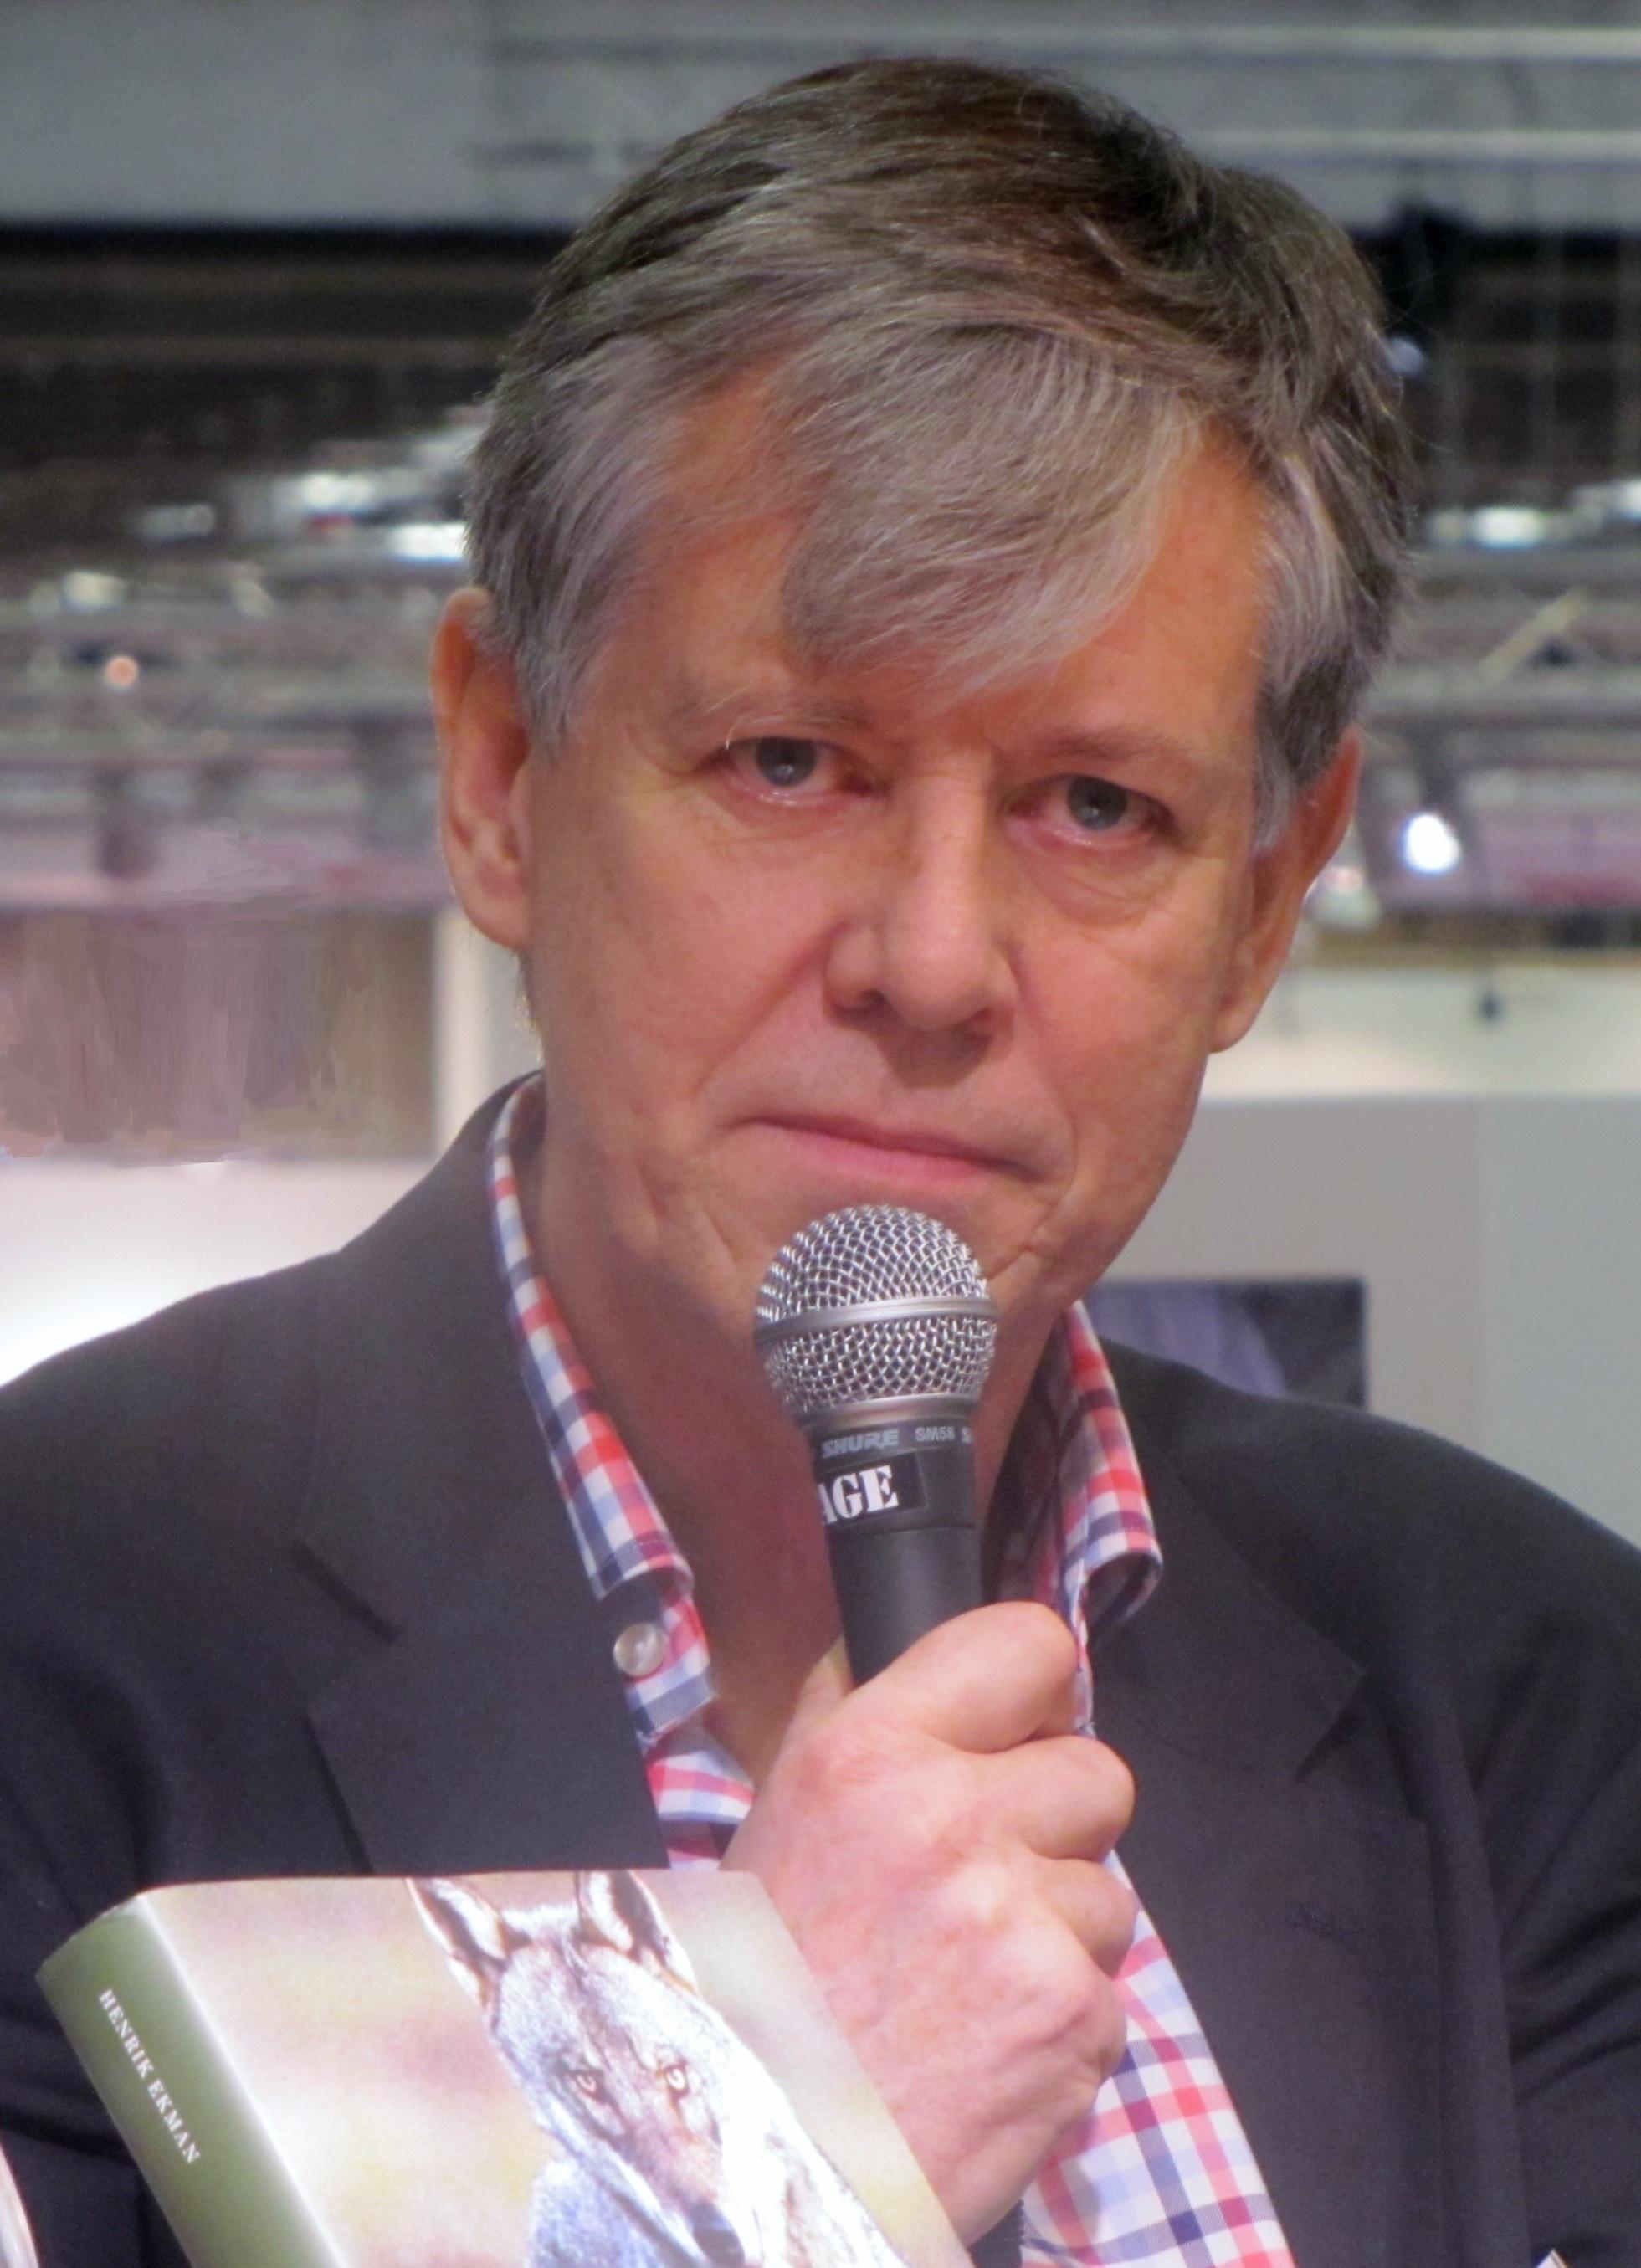 Image of Henrik Ekman from Wikidata